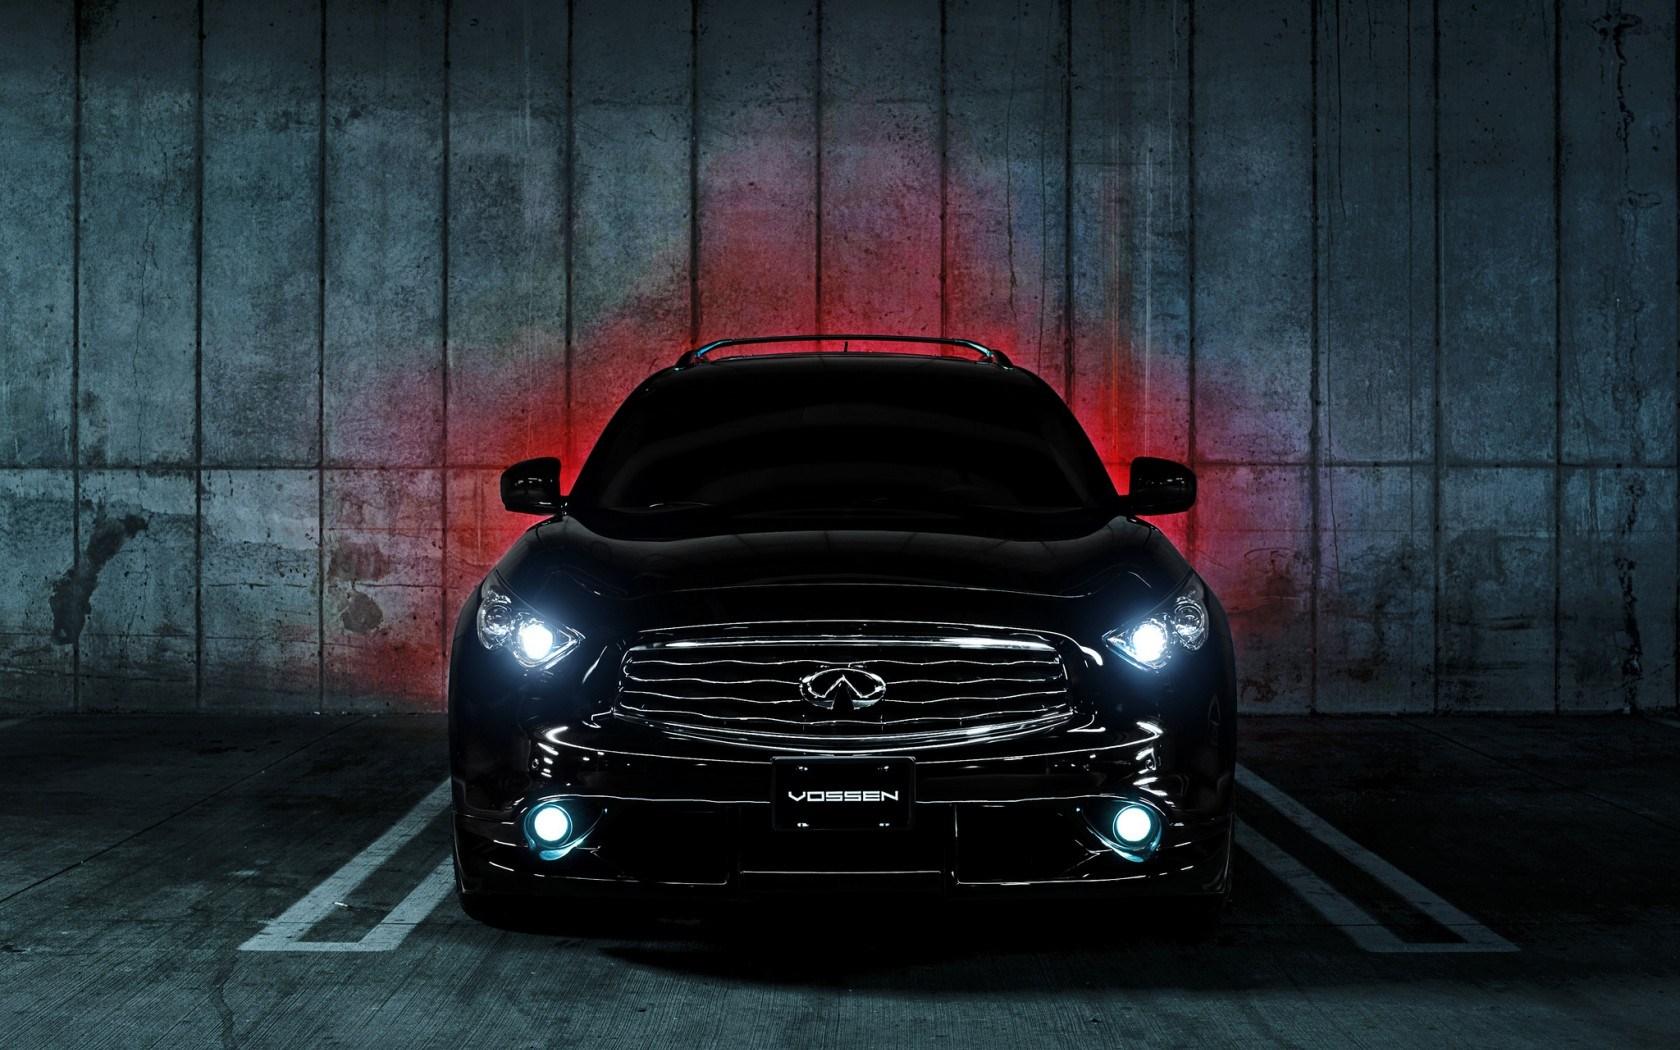 Infiniti FX35 S Vossen Lights